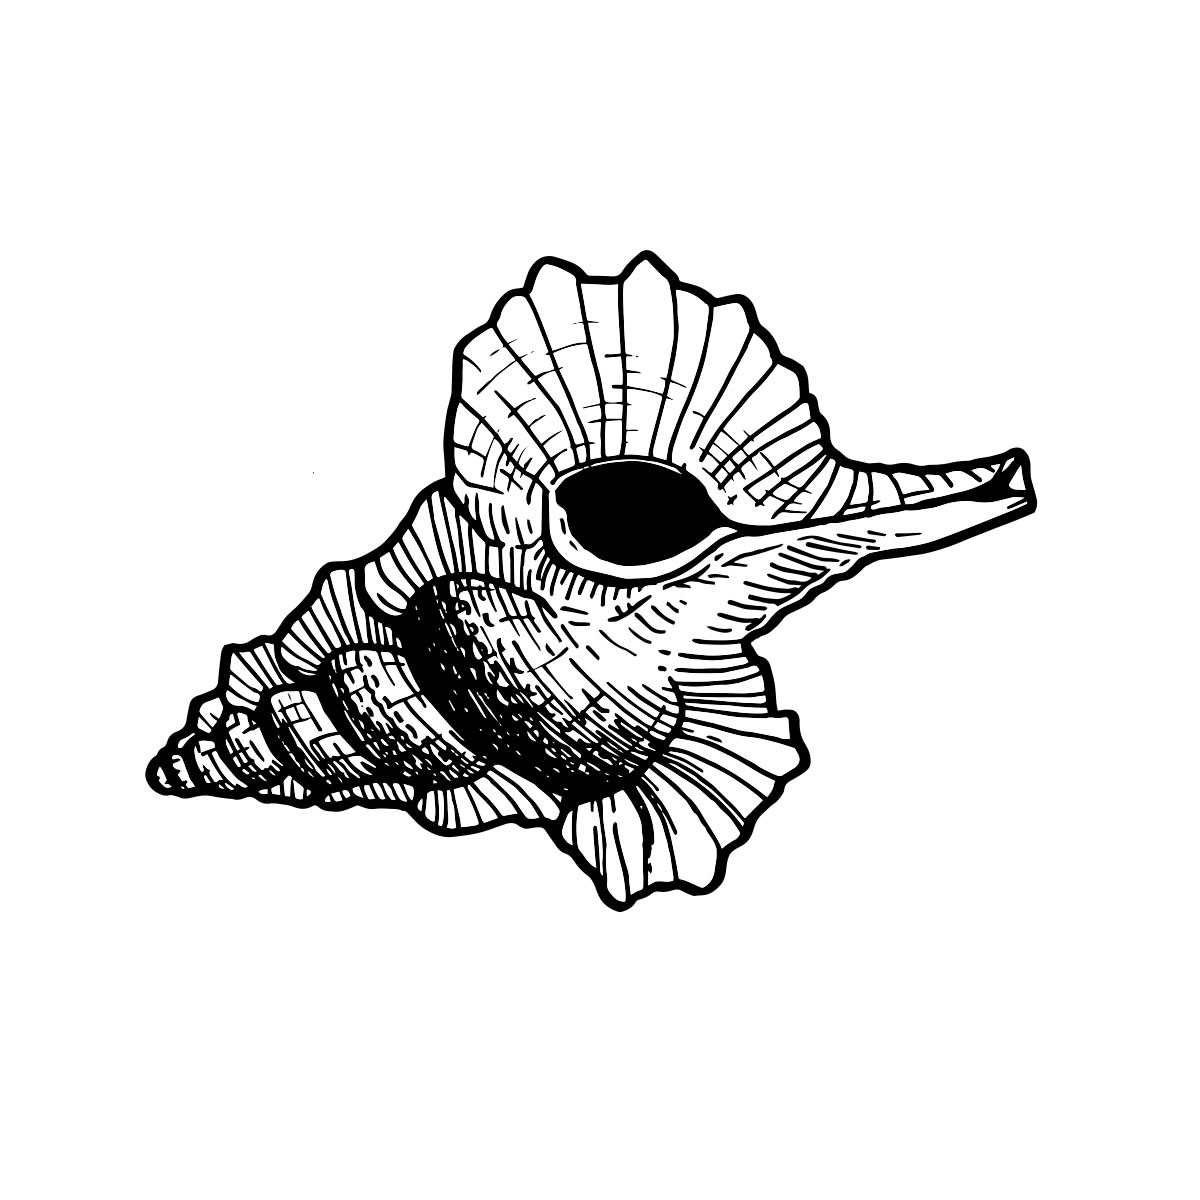 Kookaburra Whelk